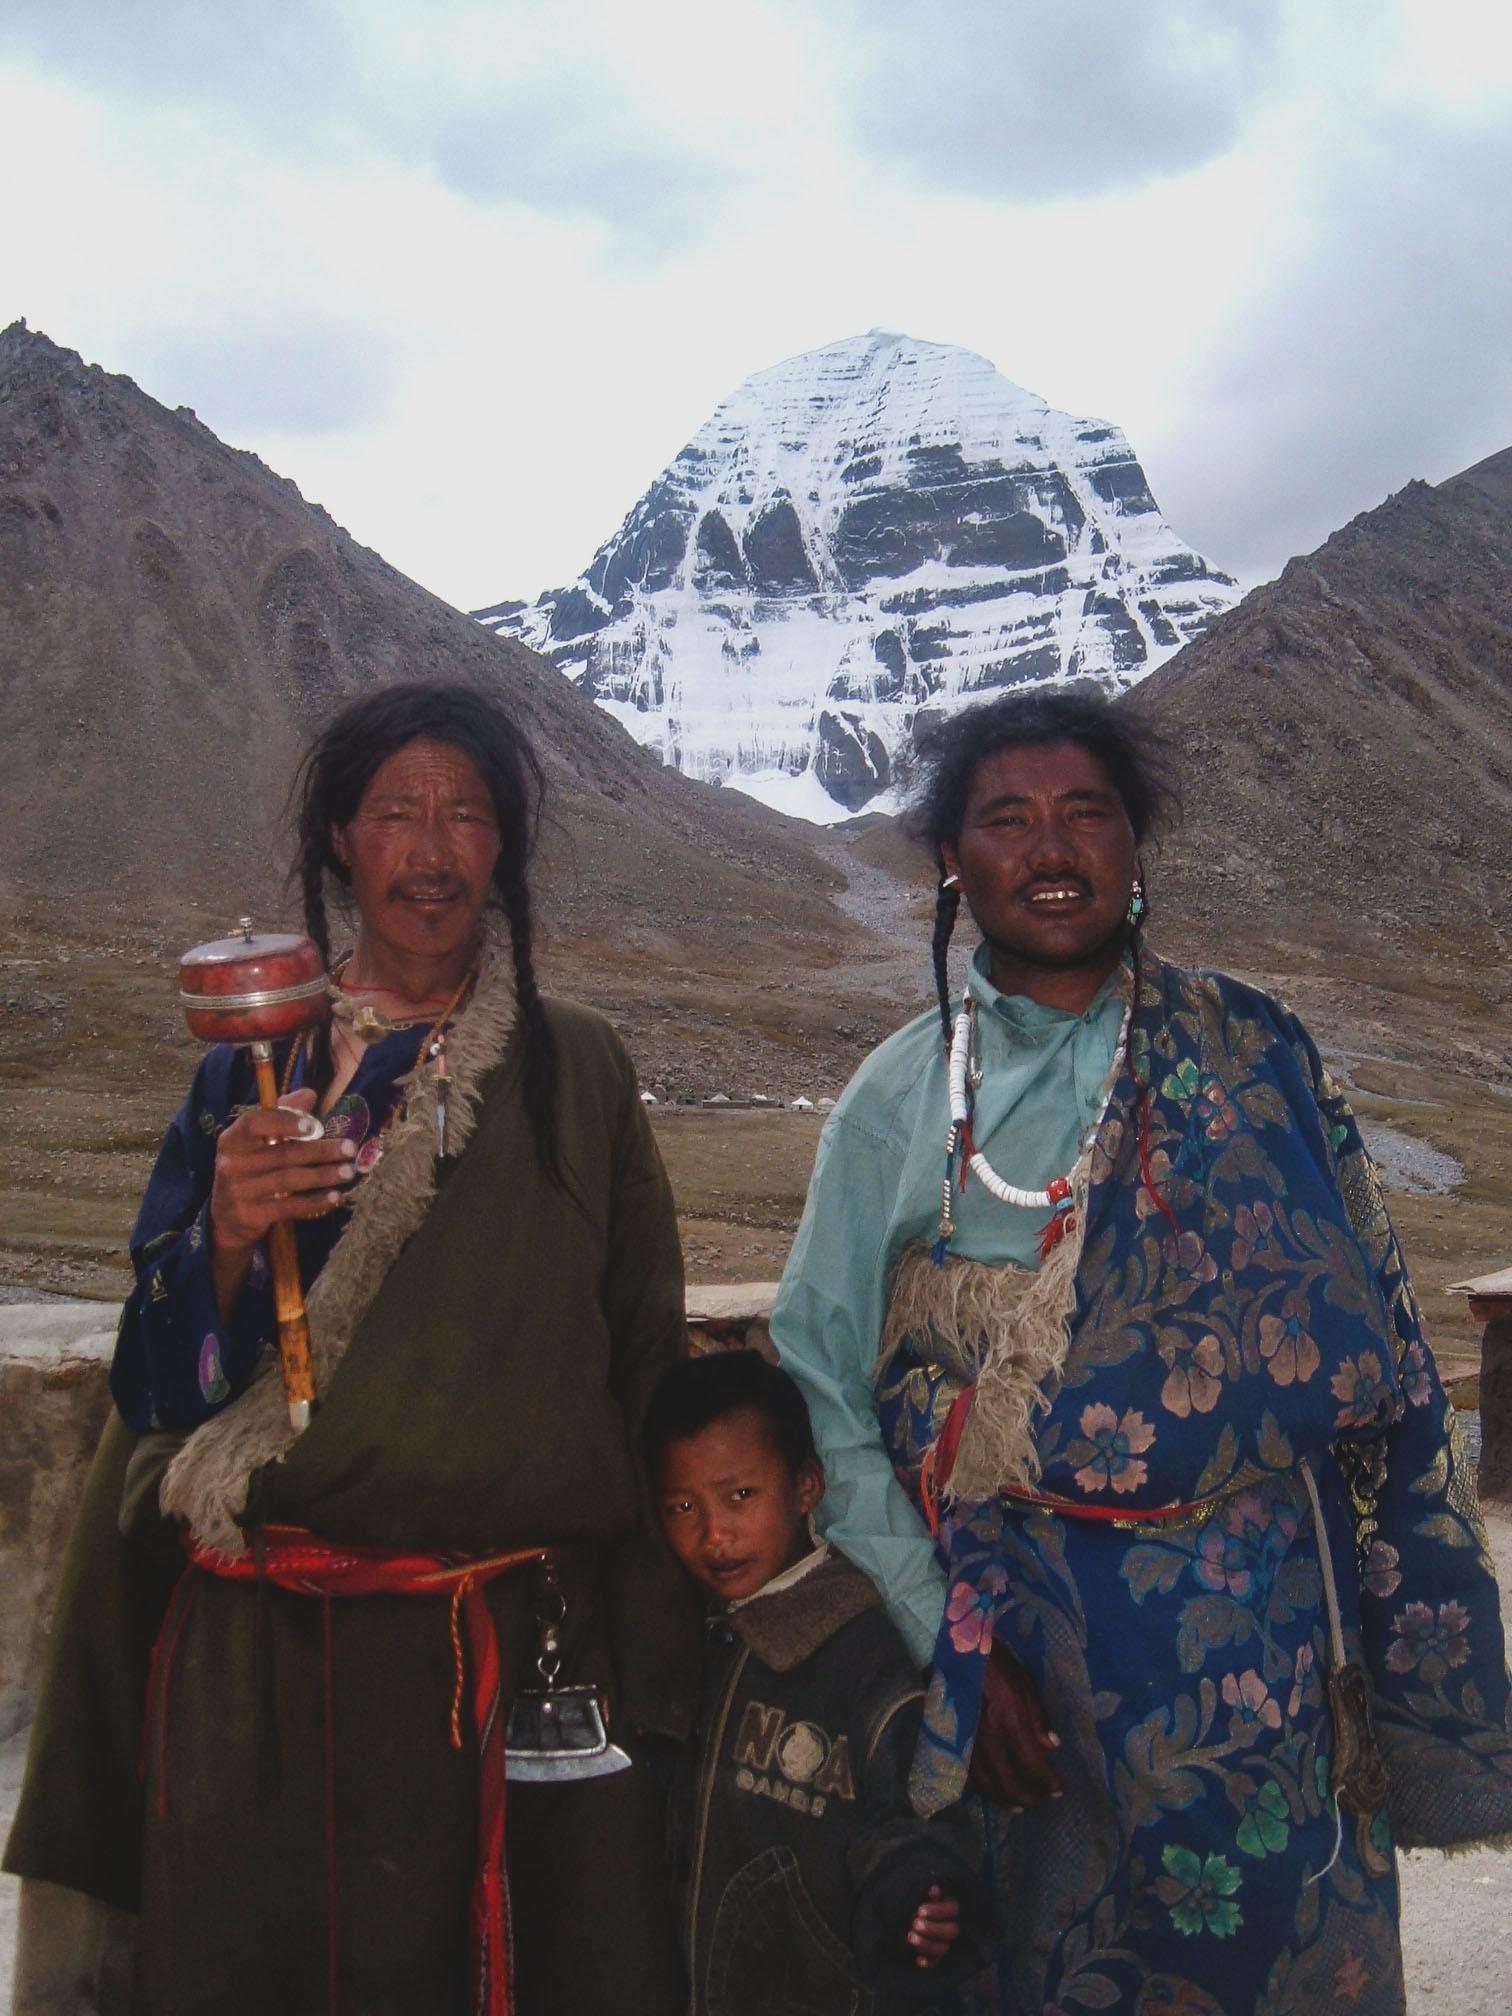 Tibetan Men & Child at Mt. Kailash